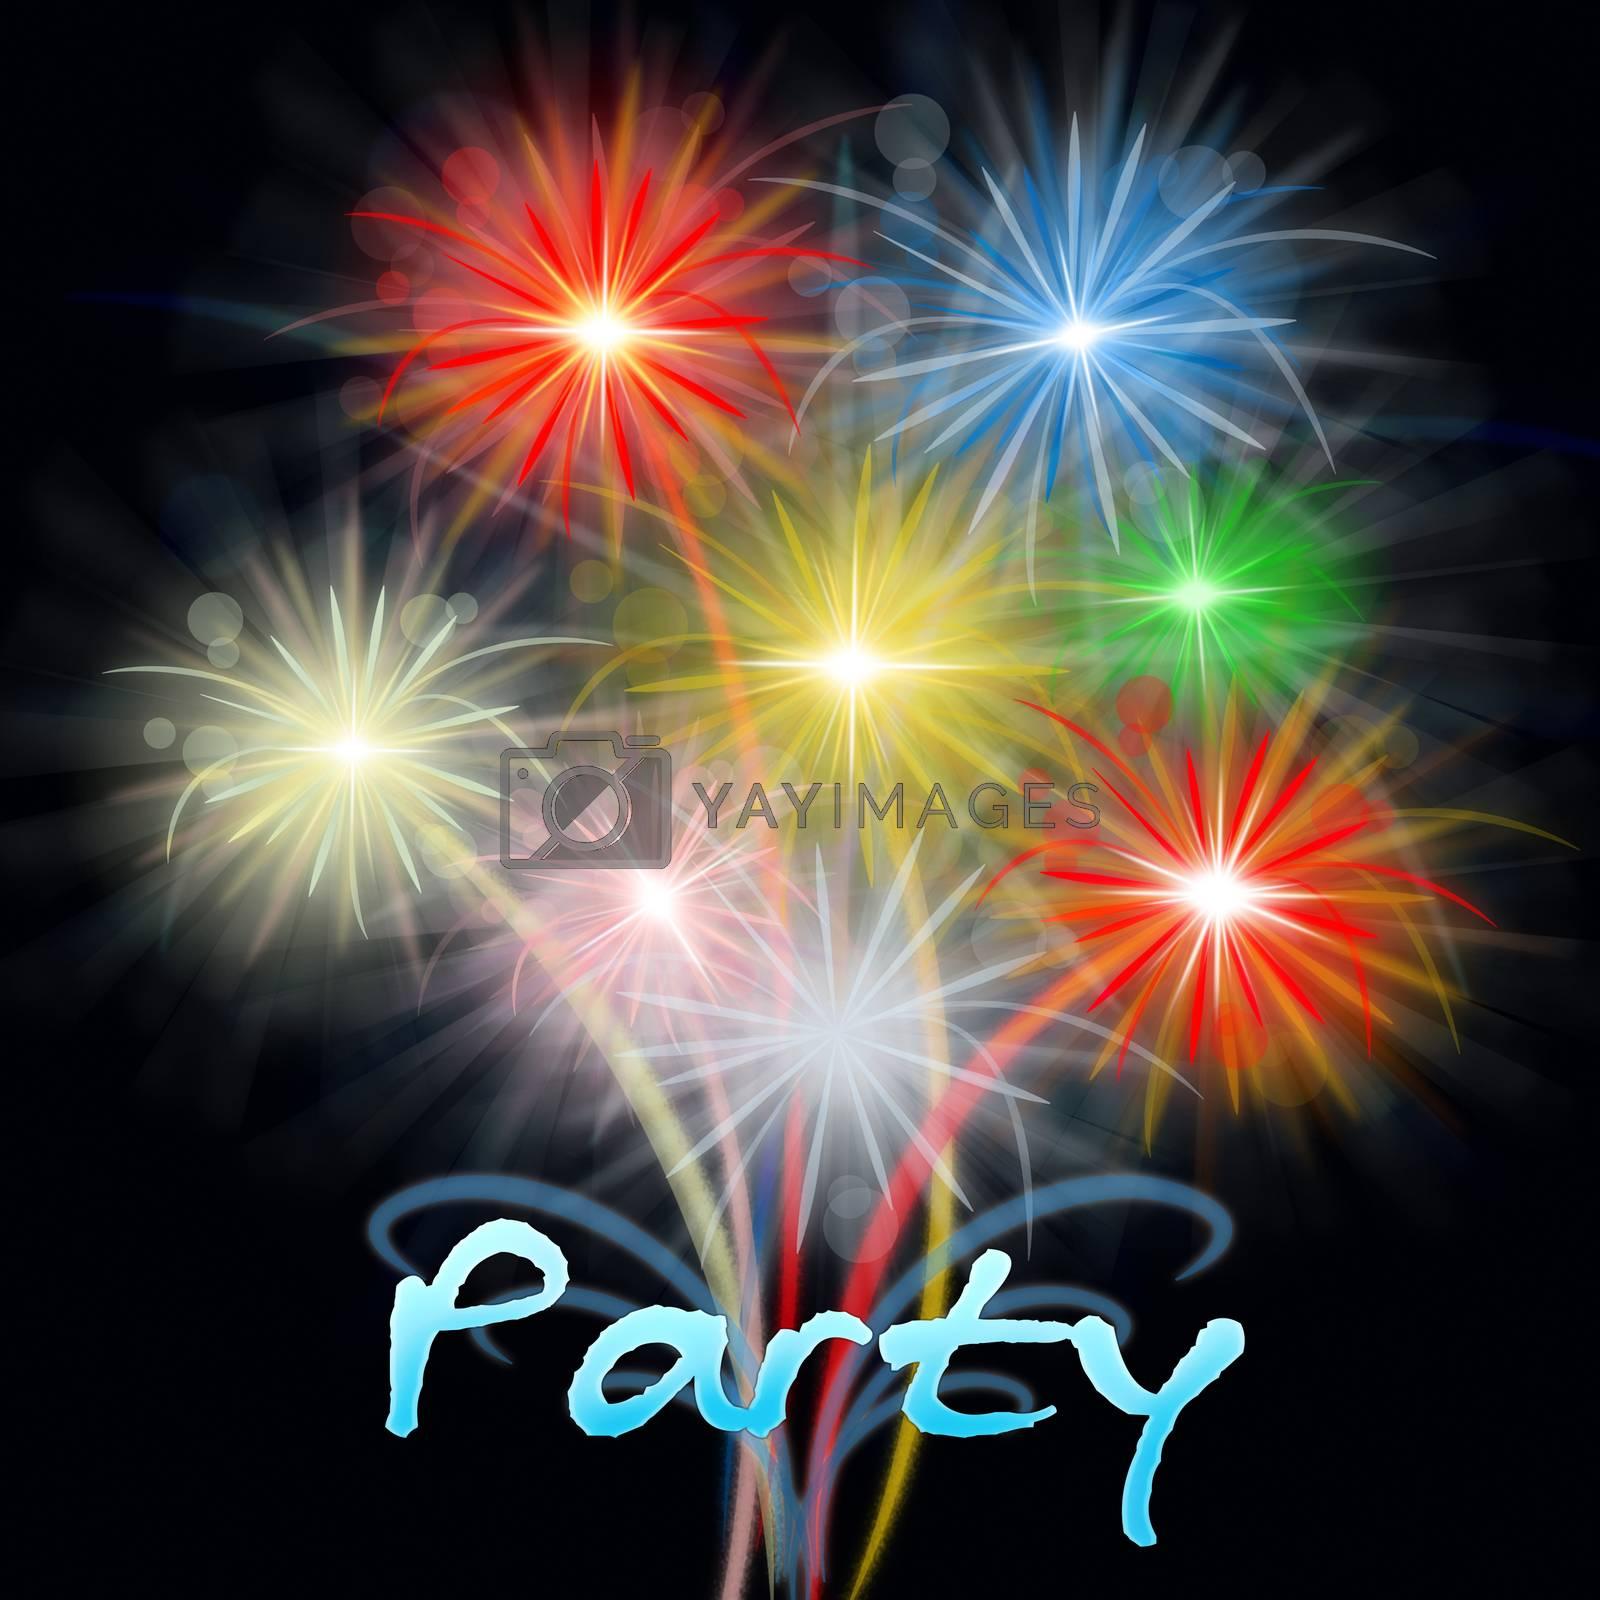 Fireworks Party Shows Exploding Pyrotechnic Explosive Celebration